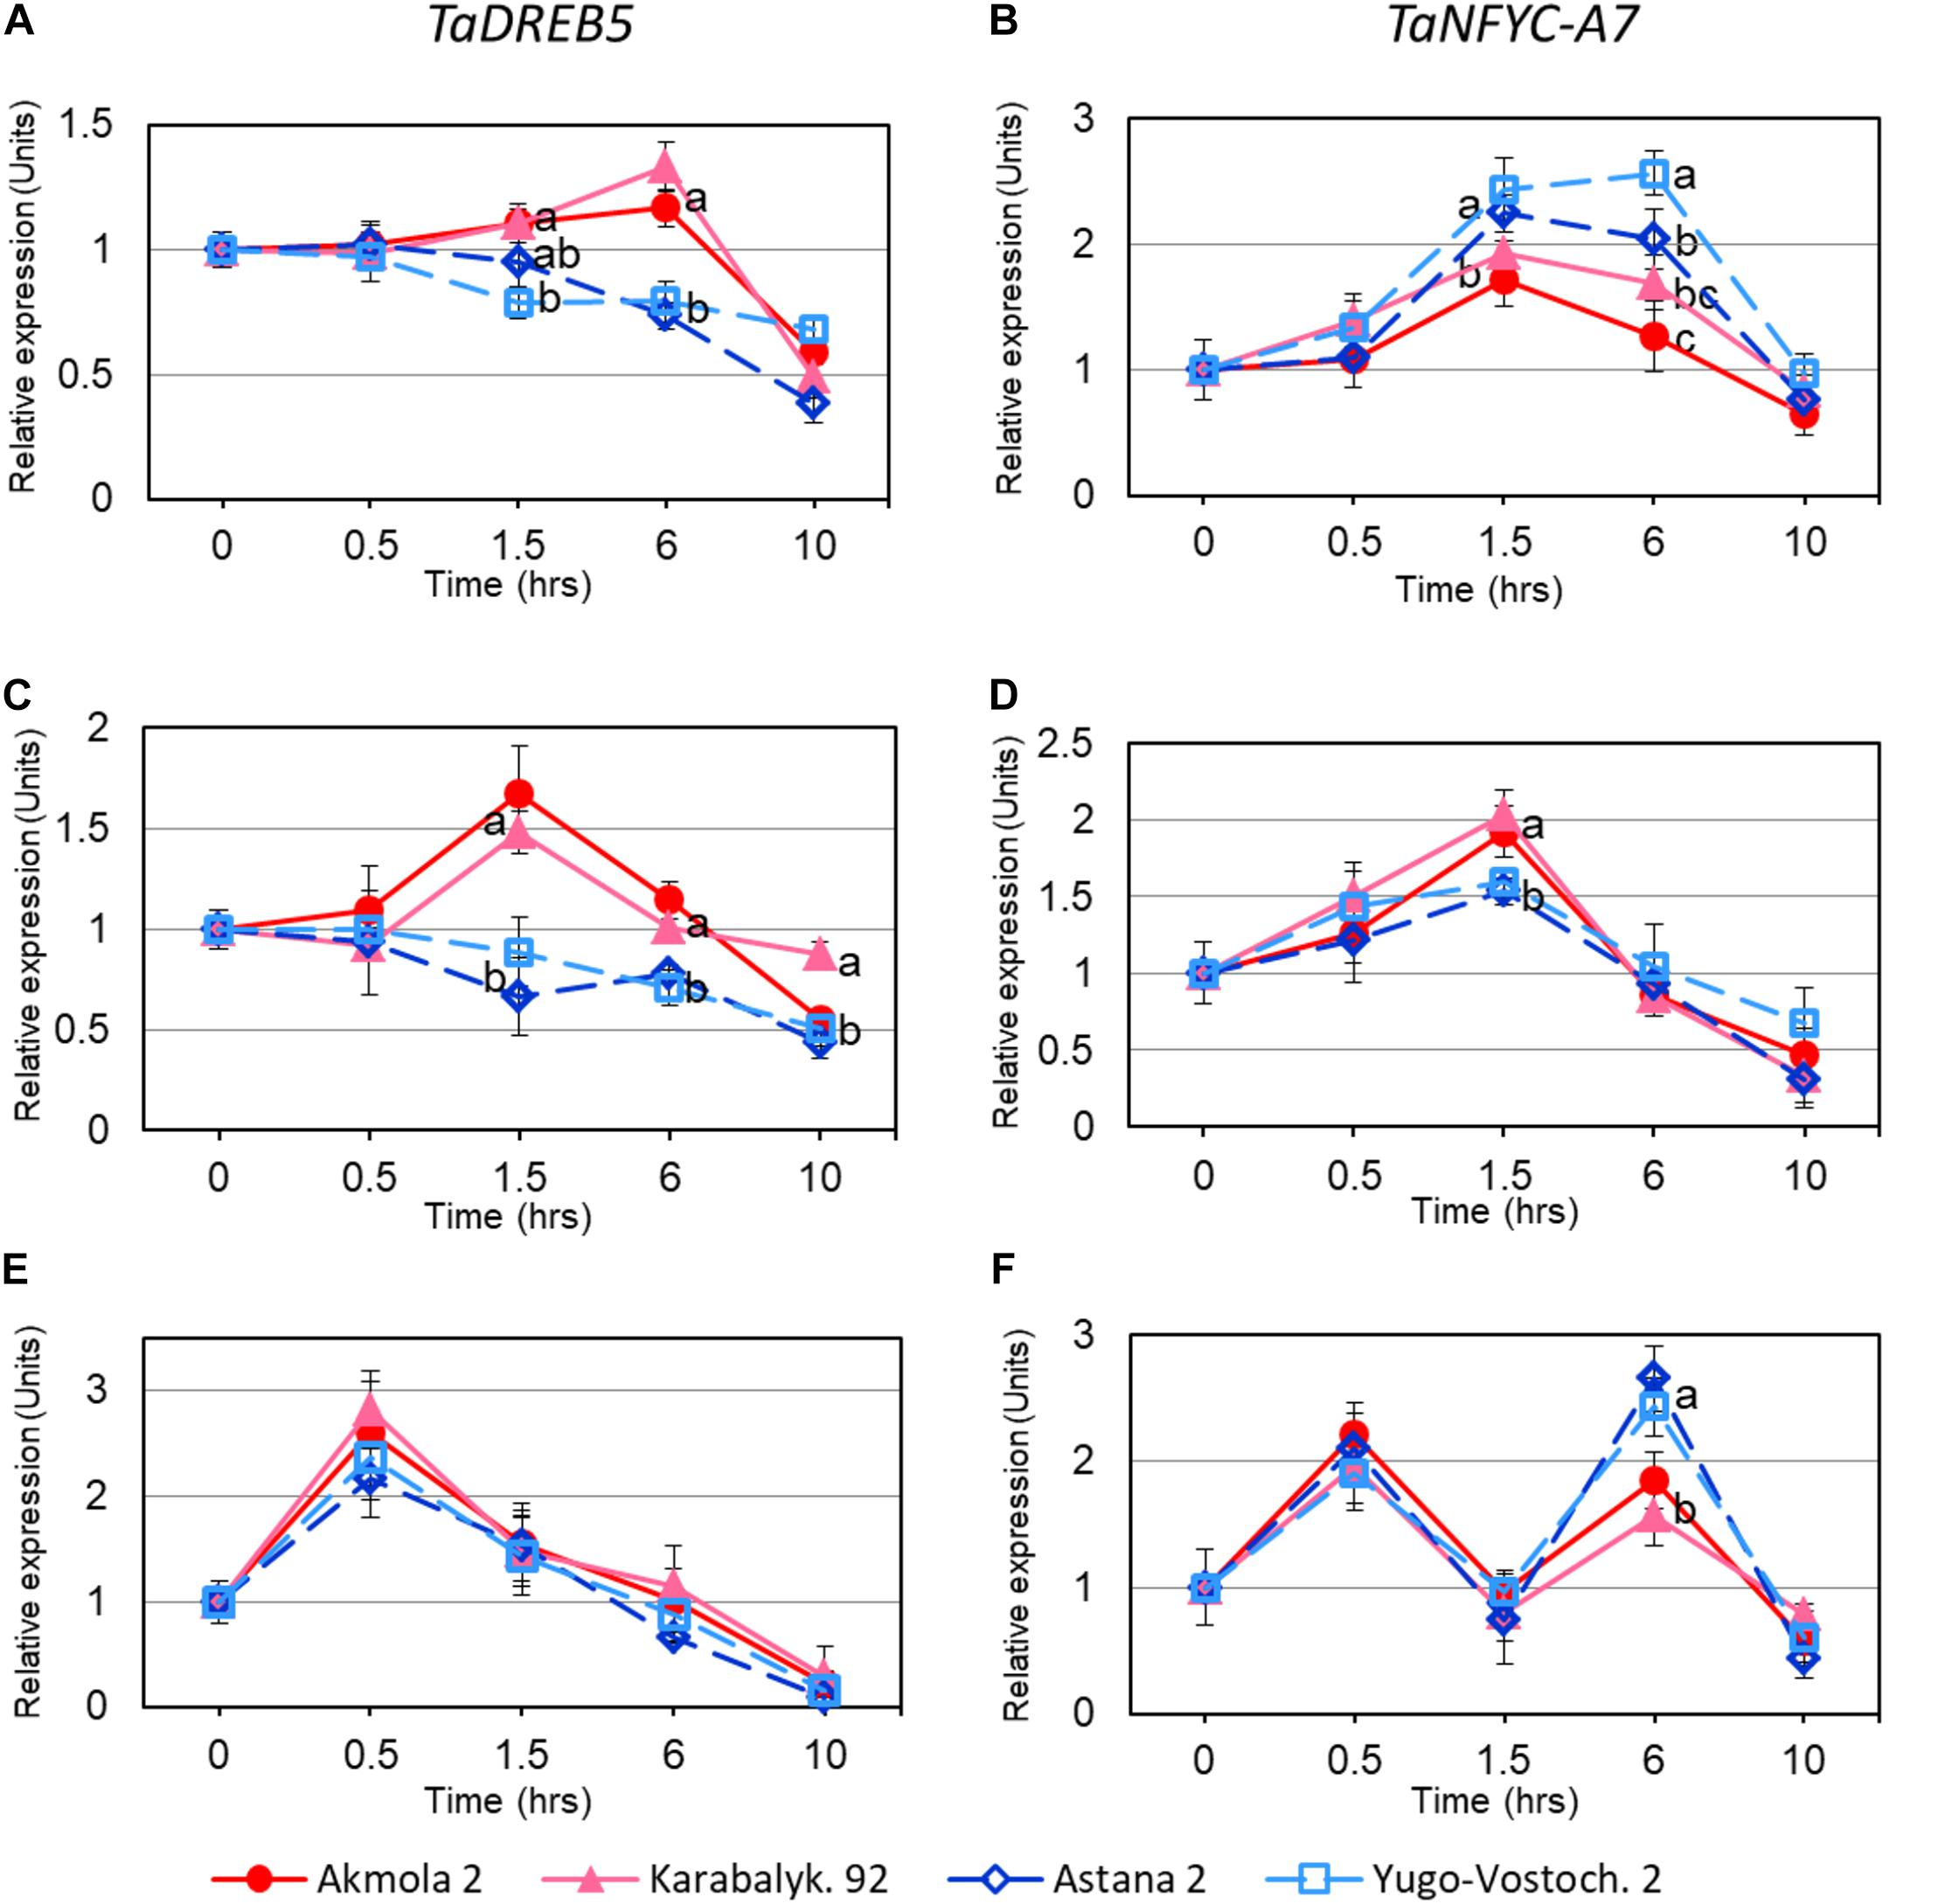 Frontiers | Genes Encoding Transcription Factors TaDREB5 and